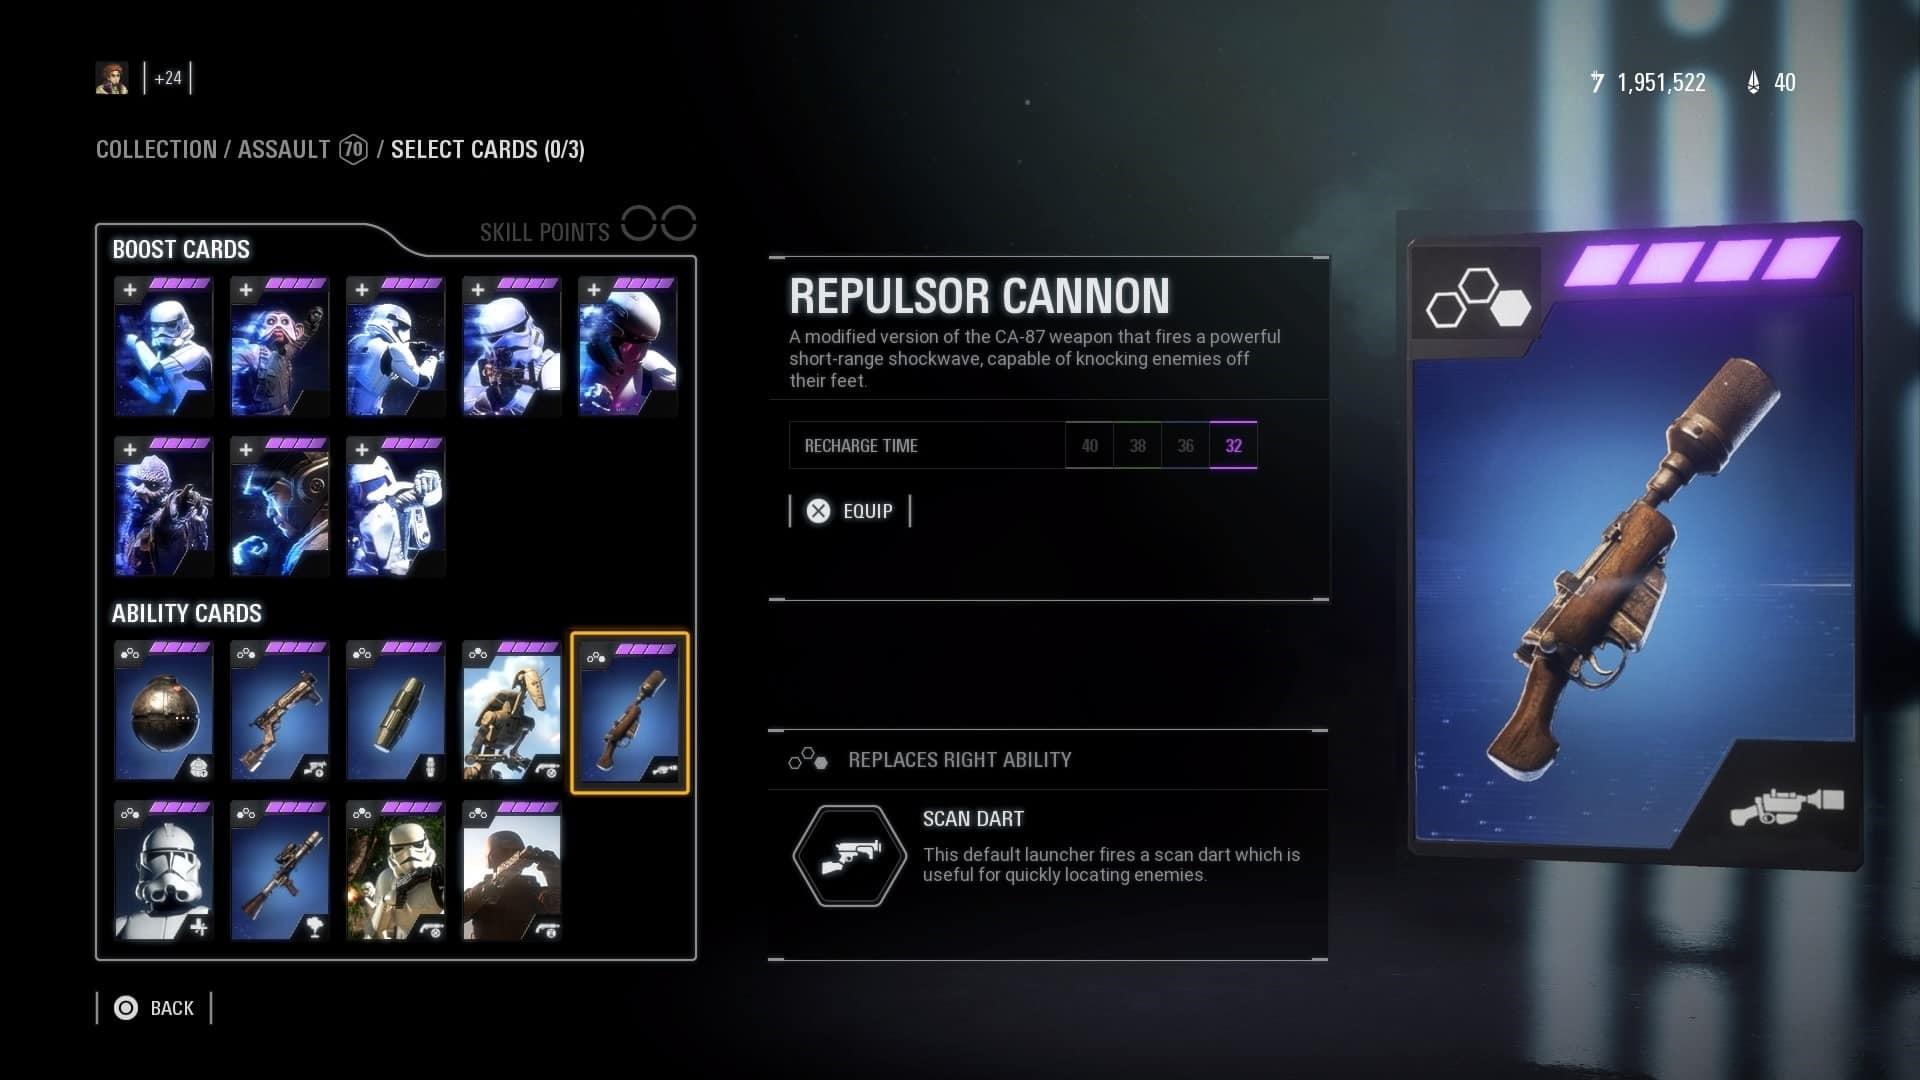 assault star cards Star Wars Battlefront 2